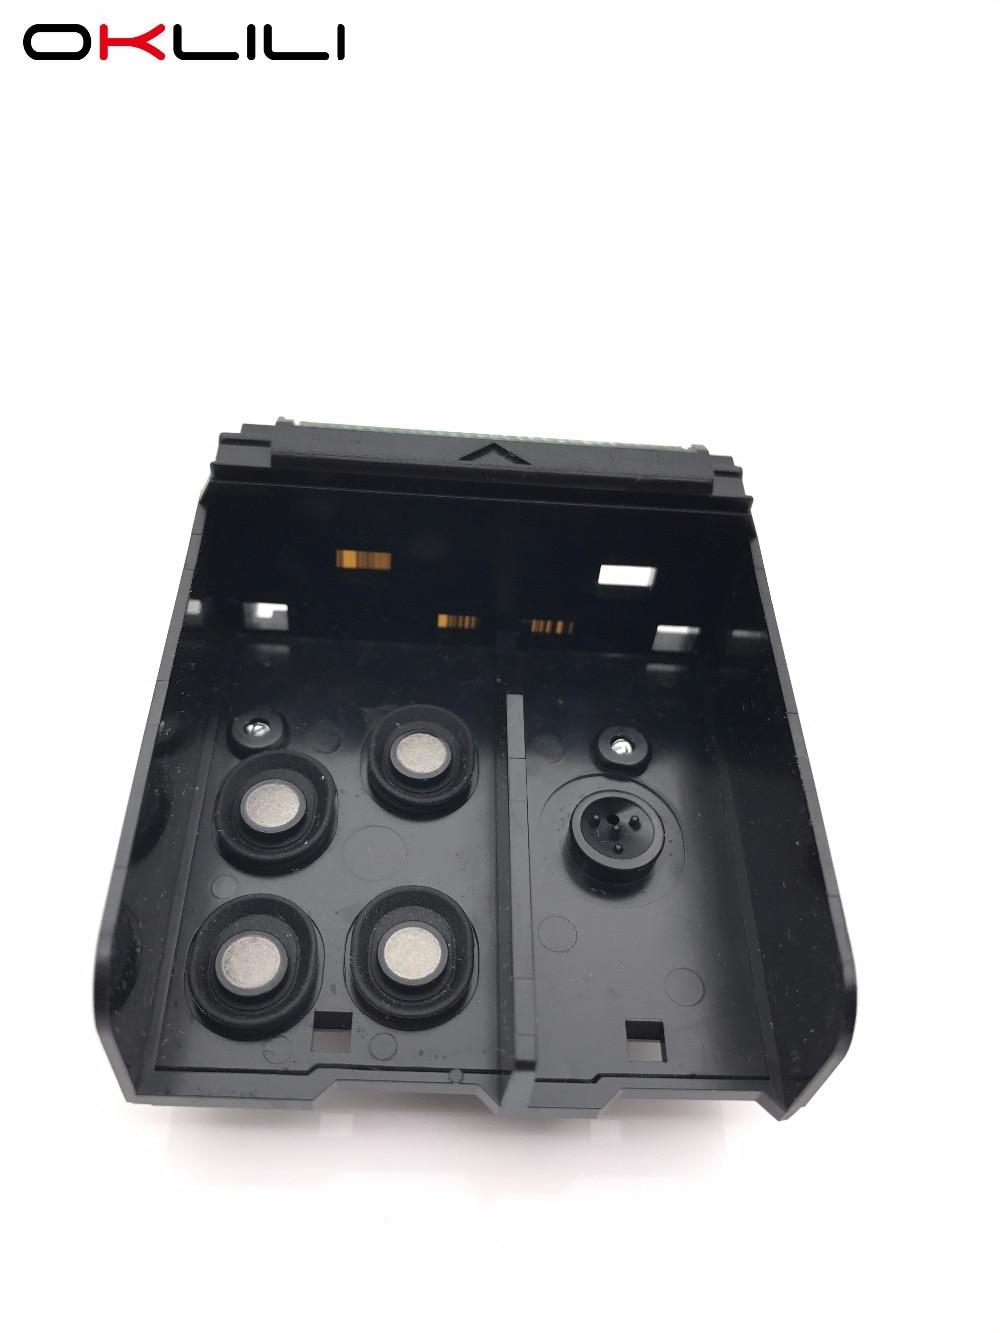 OKLILI ORIGINAL NEW QY6-0069 QY6-0069-000 Printhead Print Head Printer Head for Canon mini260 mini320 шина tdm sq0801 0069